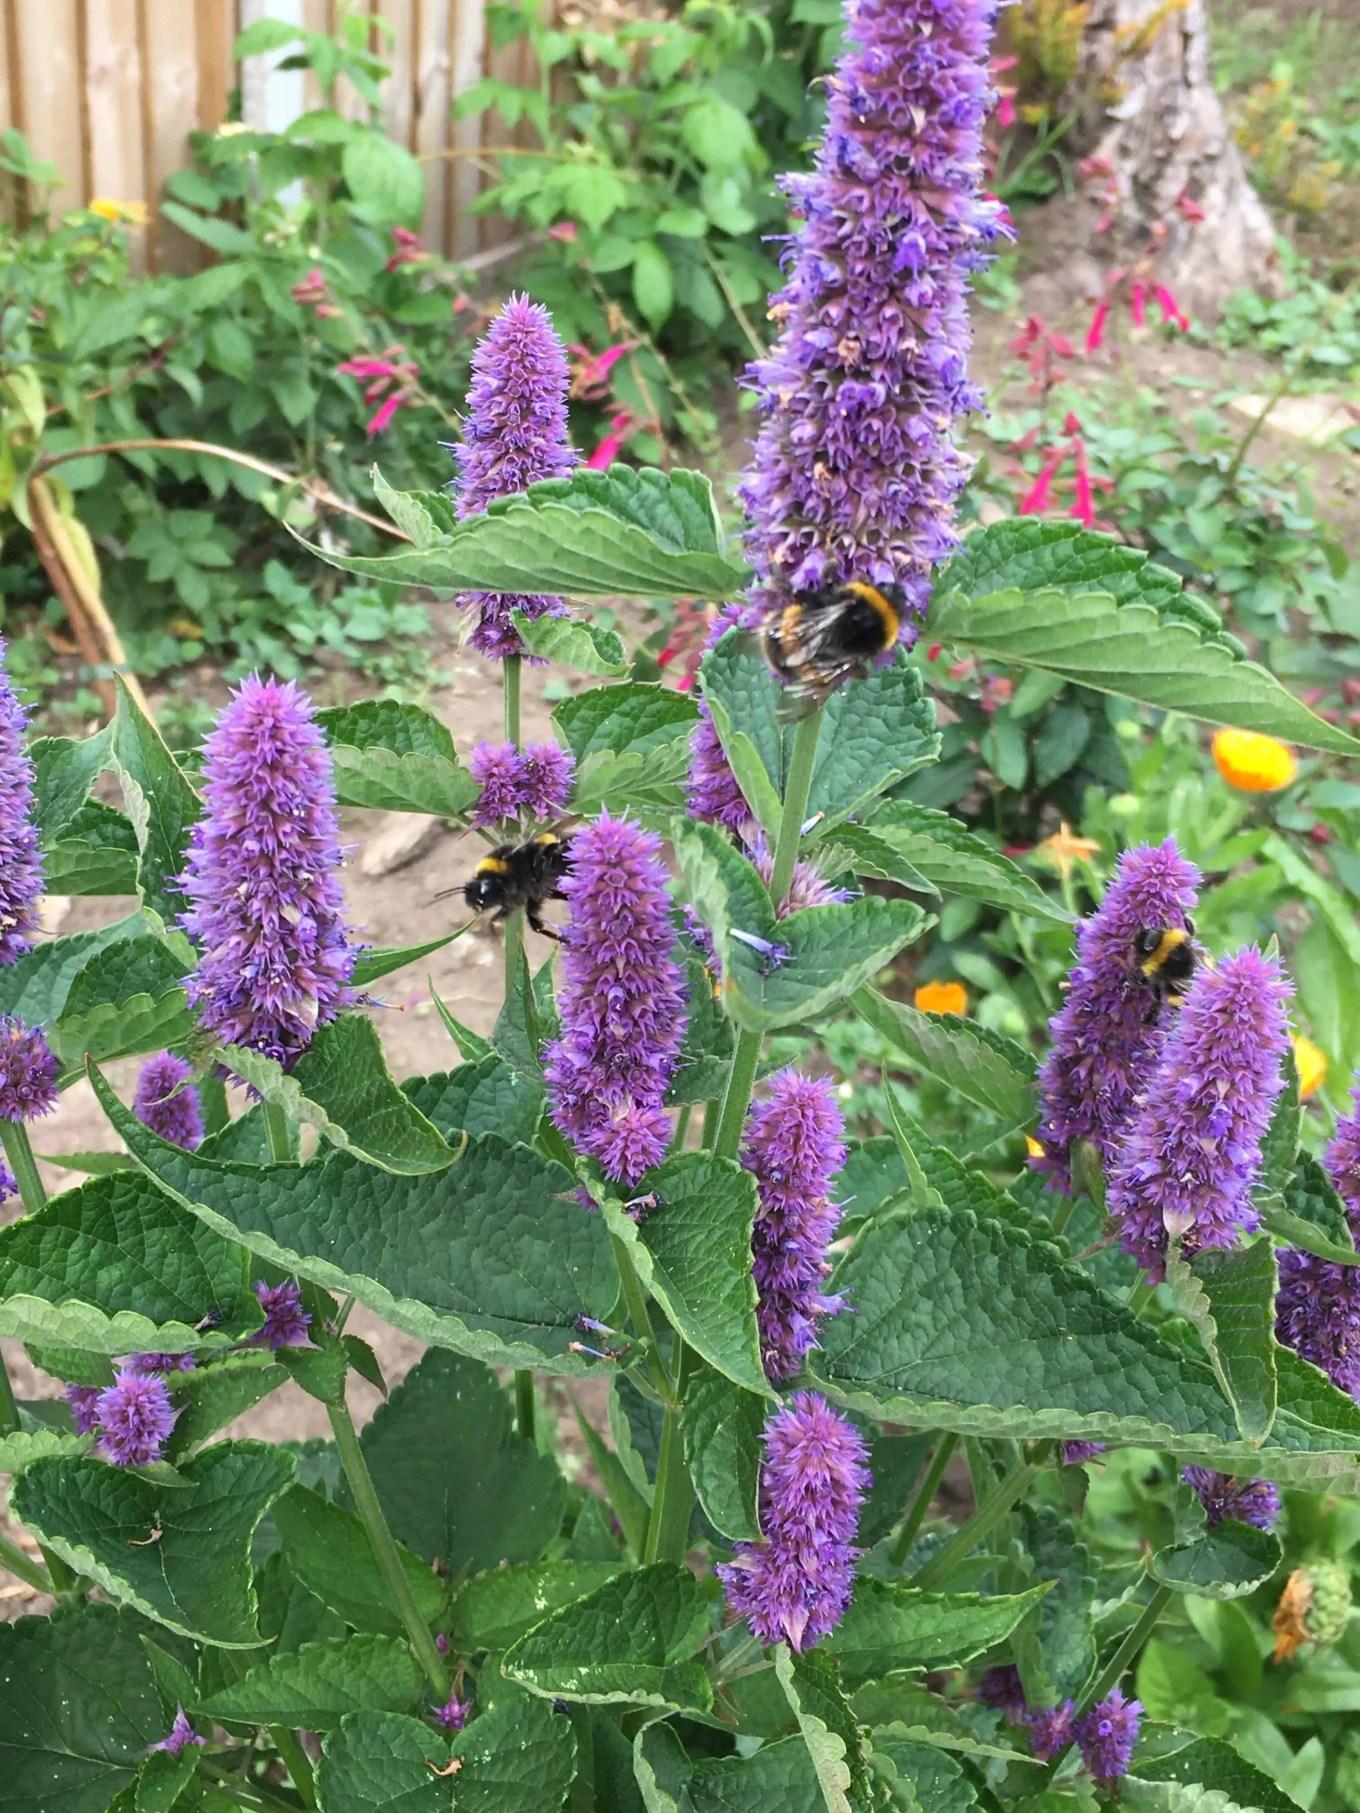 bees on a purple hyssop flower